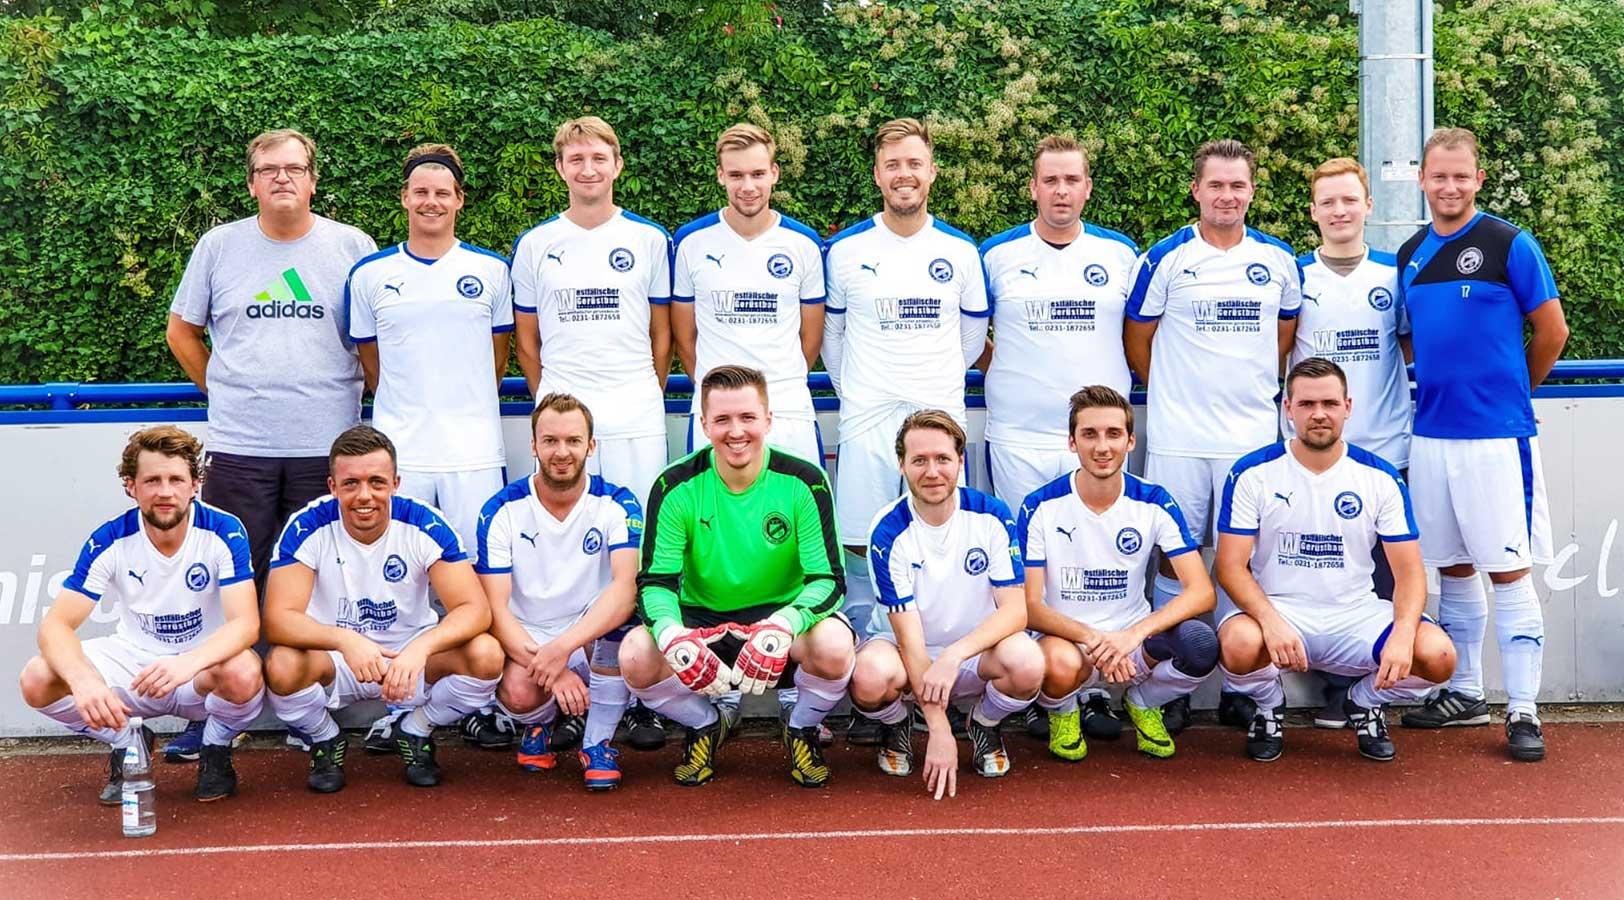 2. Mannschaft des FC Brünninghausen